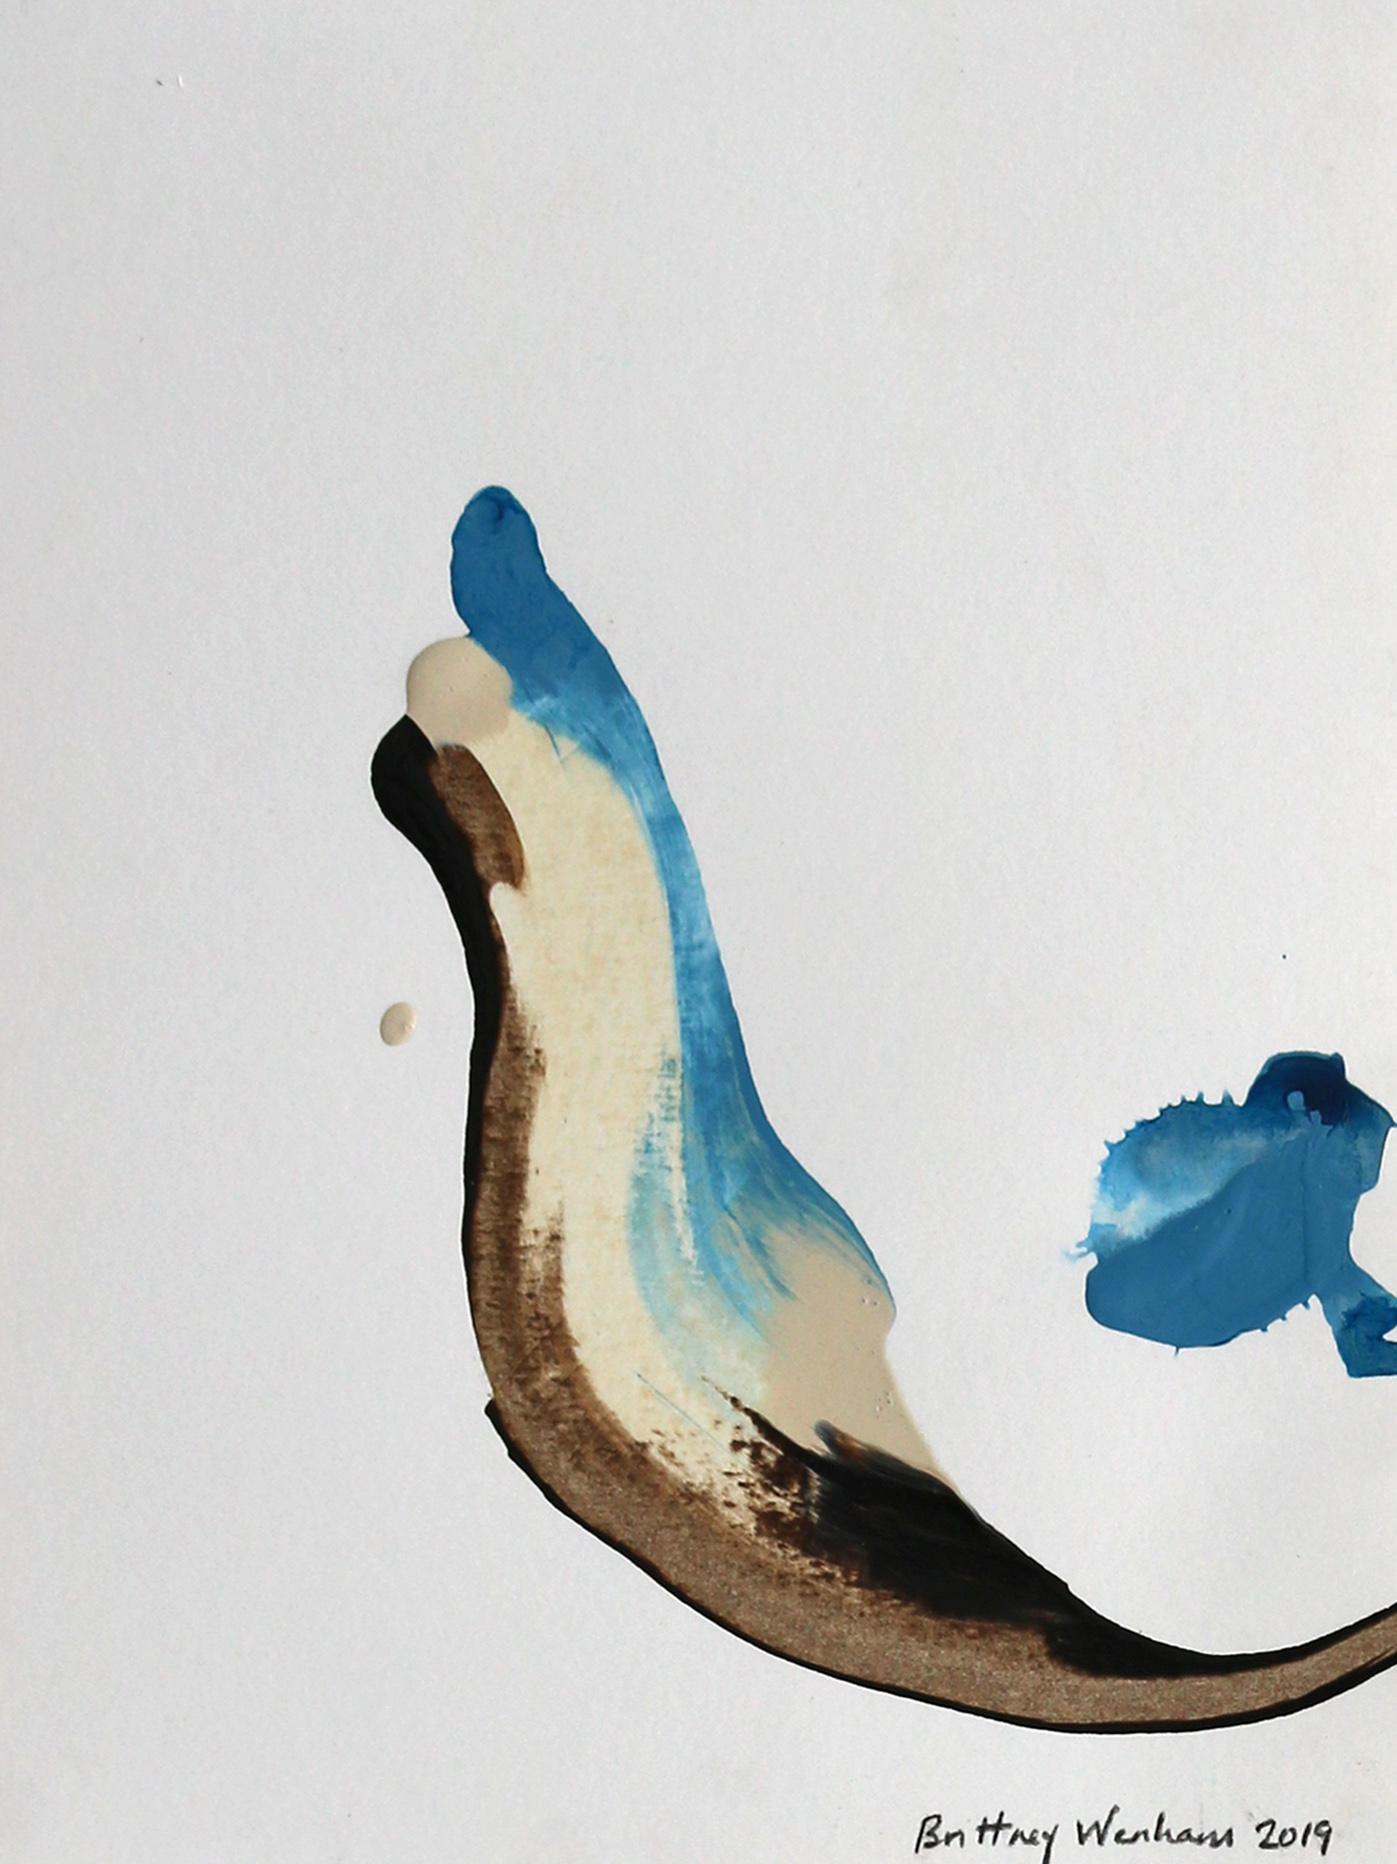 "GOLDEN THREAD BREATH #3  11.7"" x 8.3"", Acrylic paint on paper, 2019"